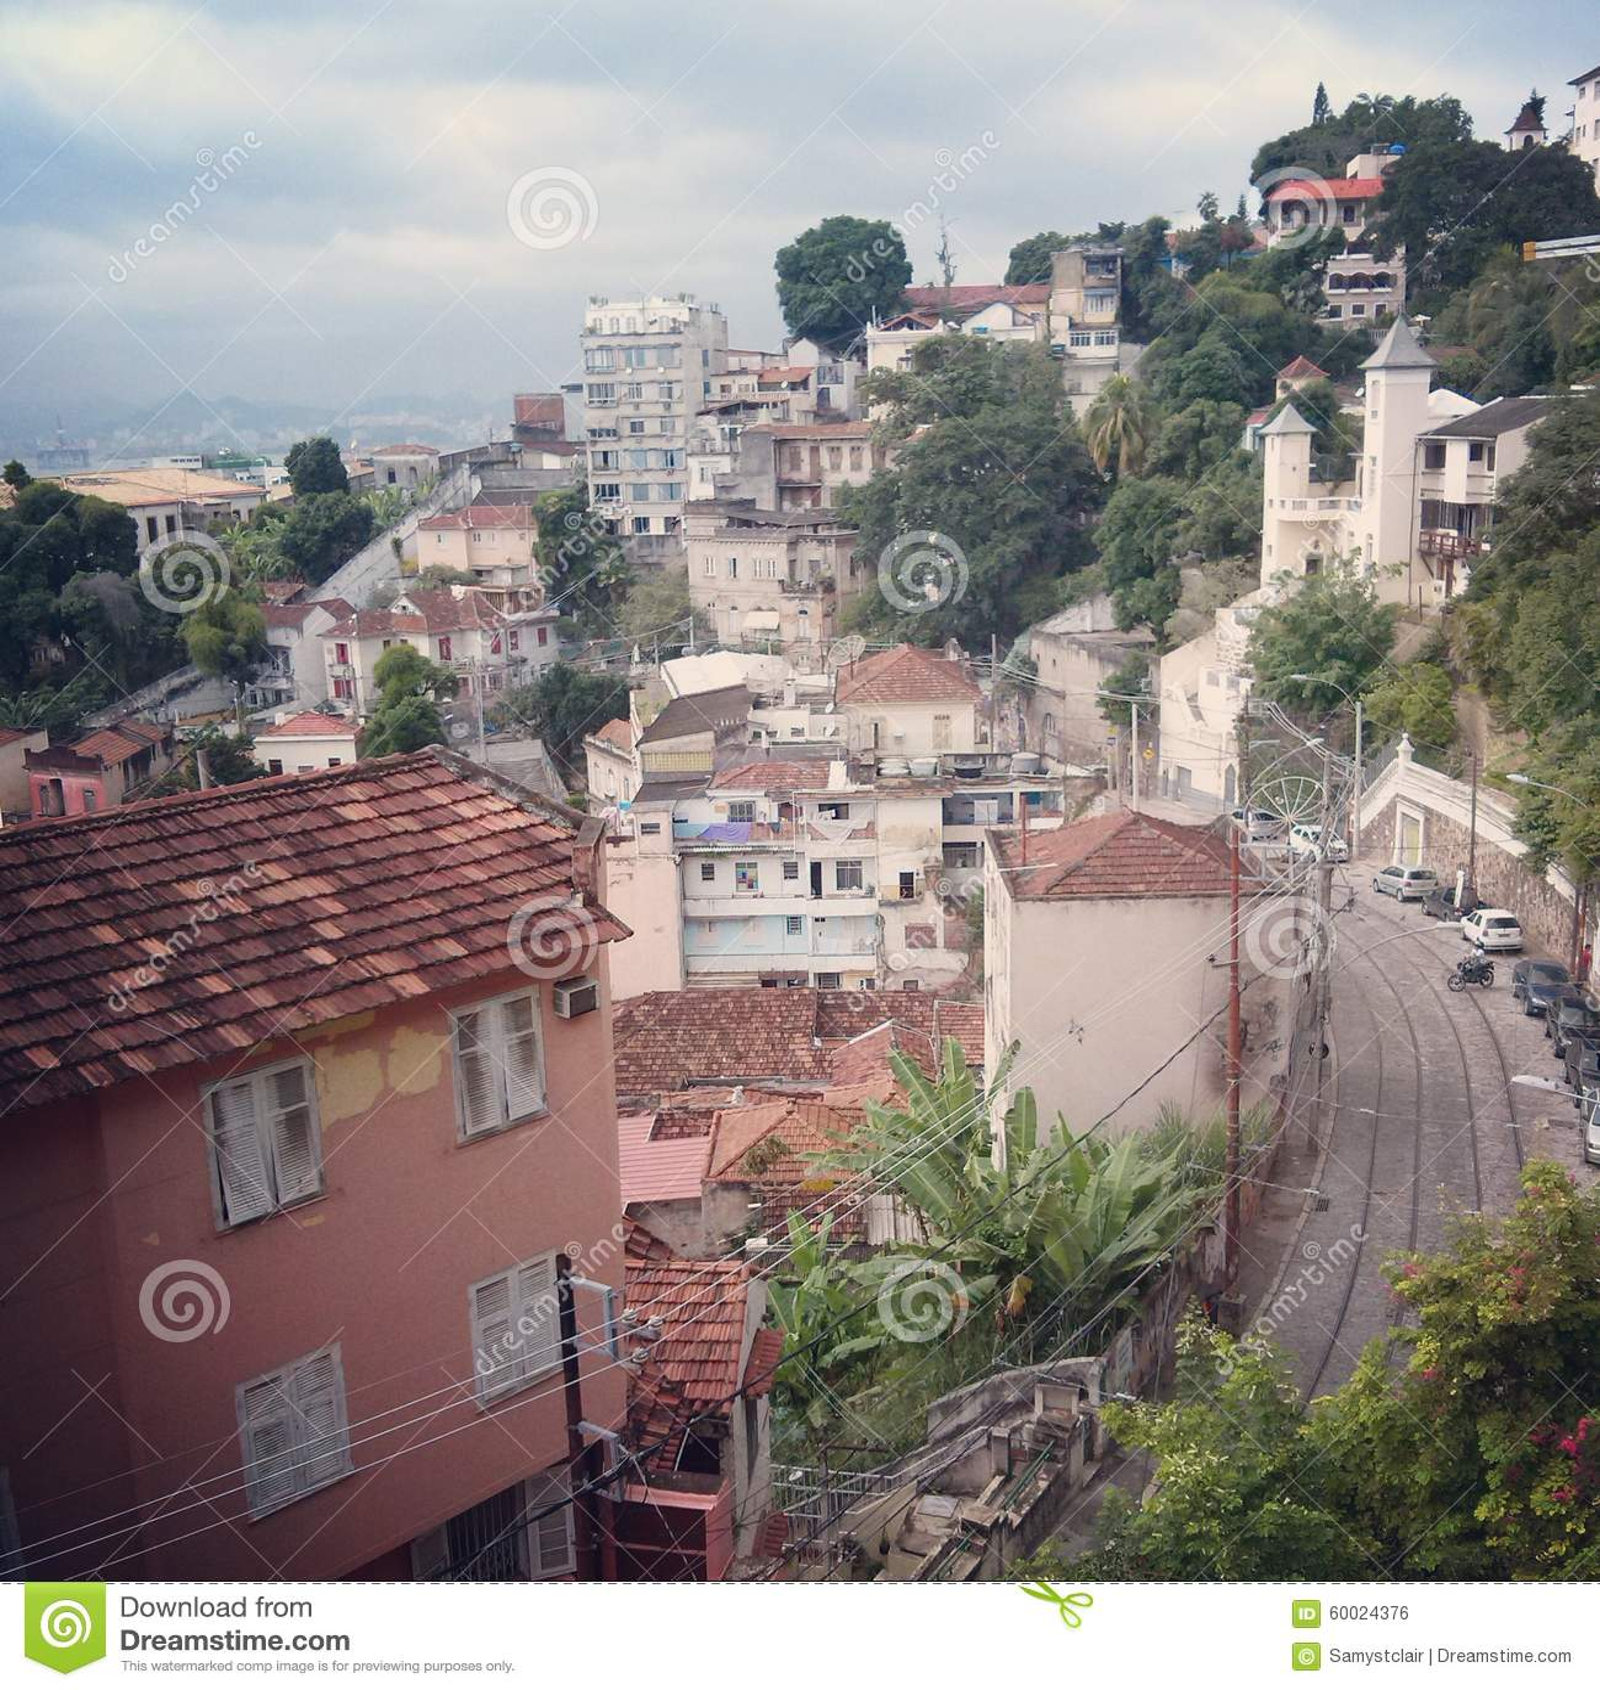 street in santa teresa rio de janeiro brazil stock photo image 60024376. Black Bedroom Furniture Sets. Home Design Ideas